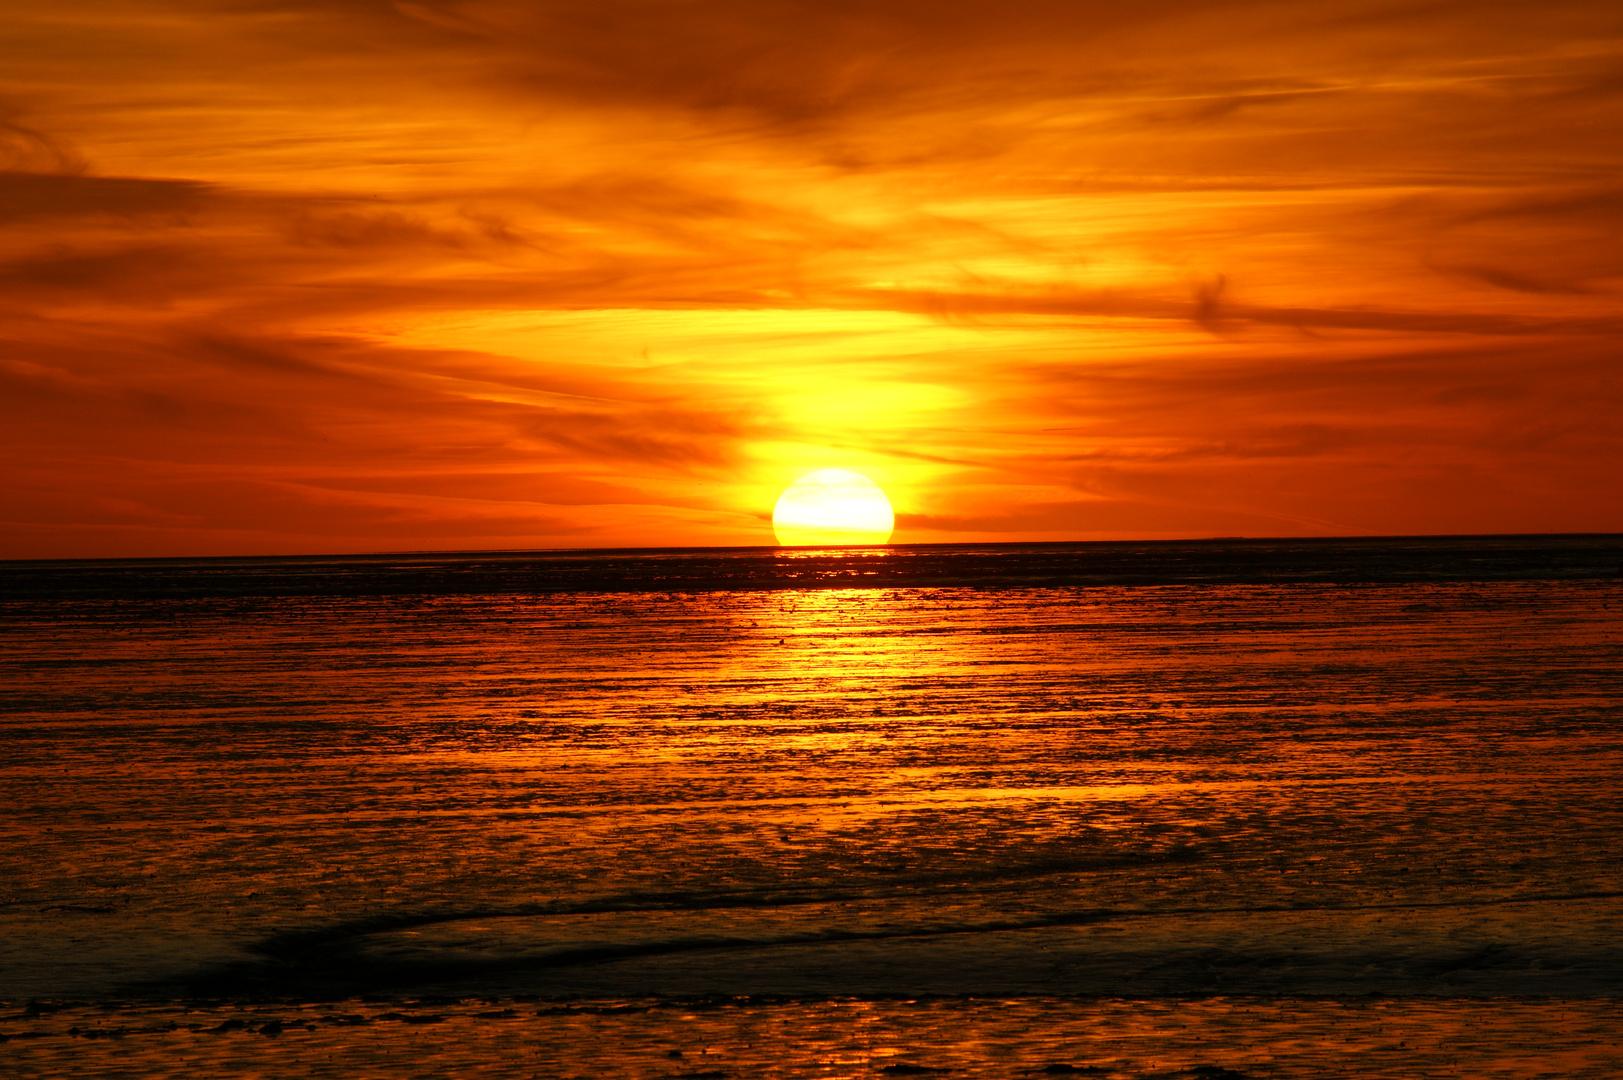 Sonnenuntergang an der Nordseeküste